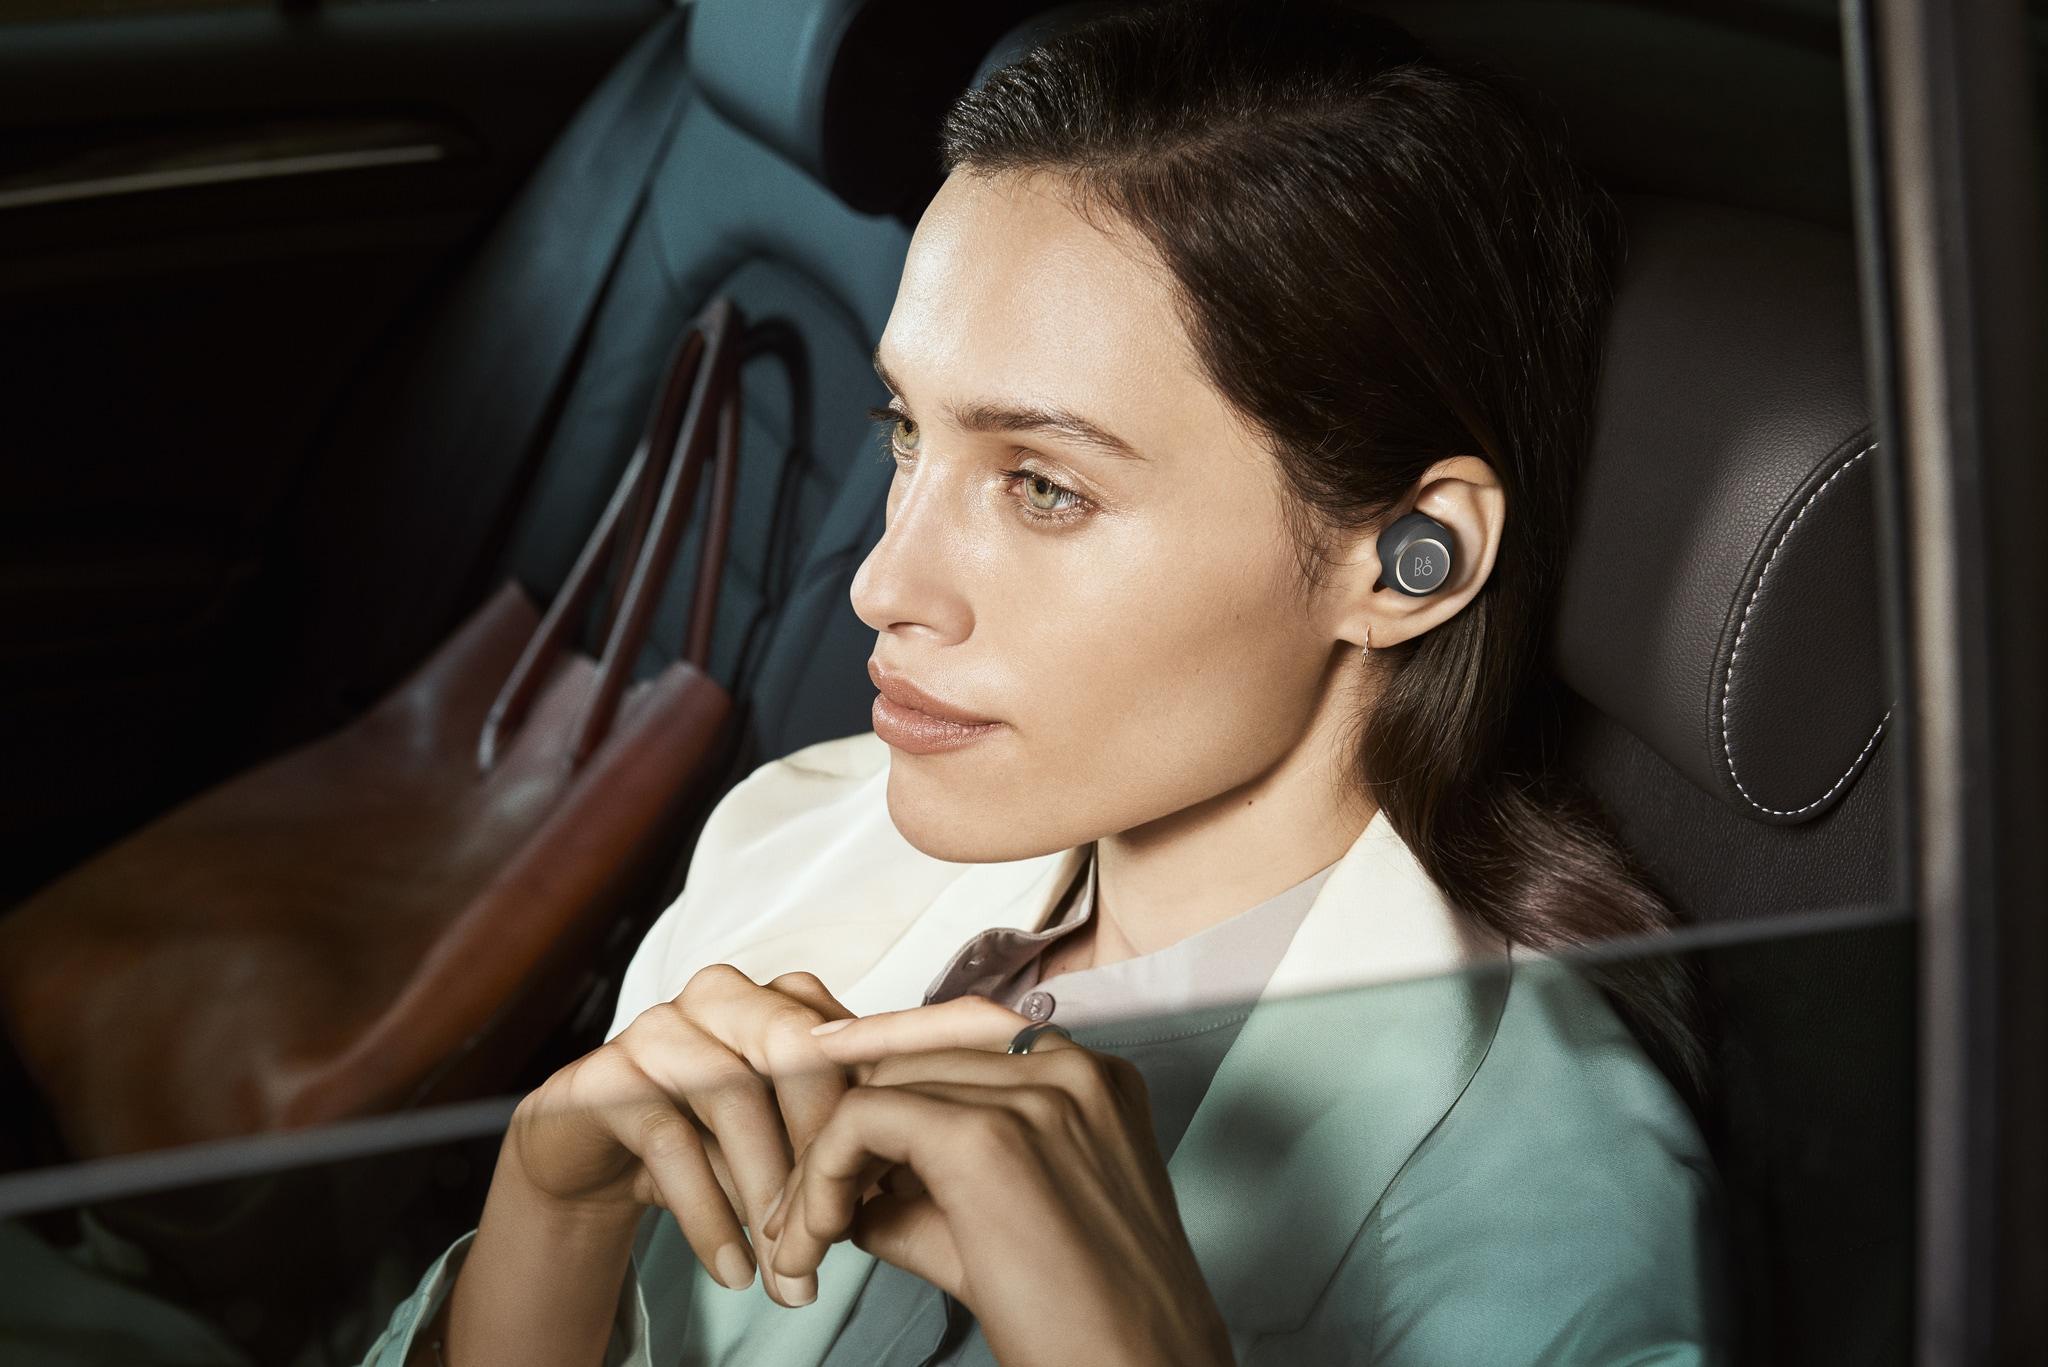 Beoplay E8 Wireless Headphones